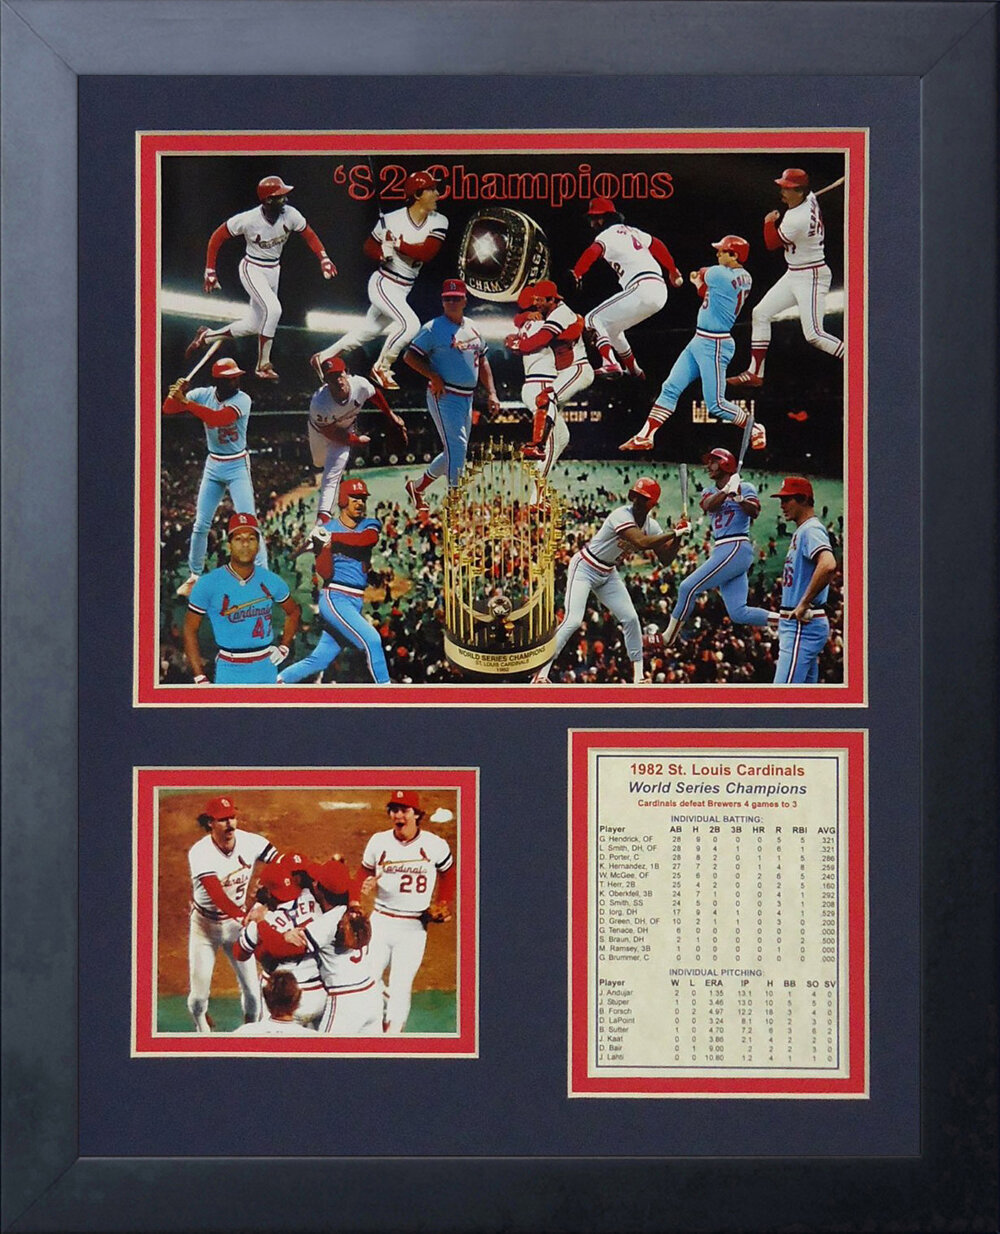 Legends Never Die 1982 St Louis Cardinals Framed Memorabilia